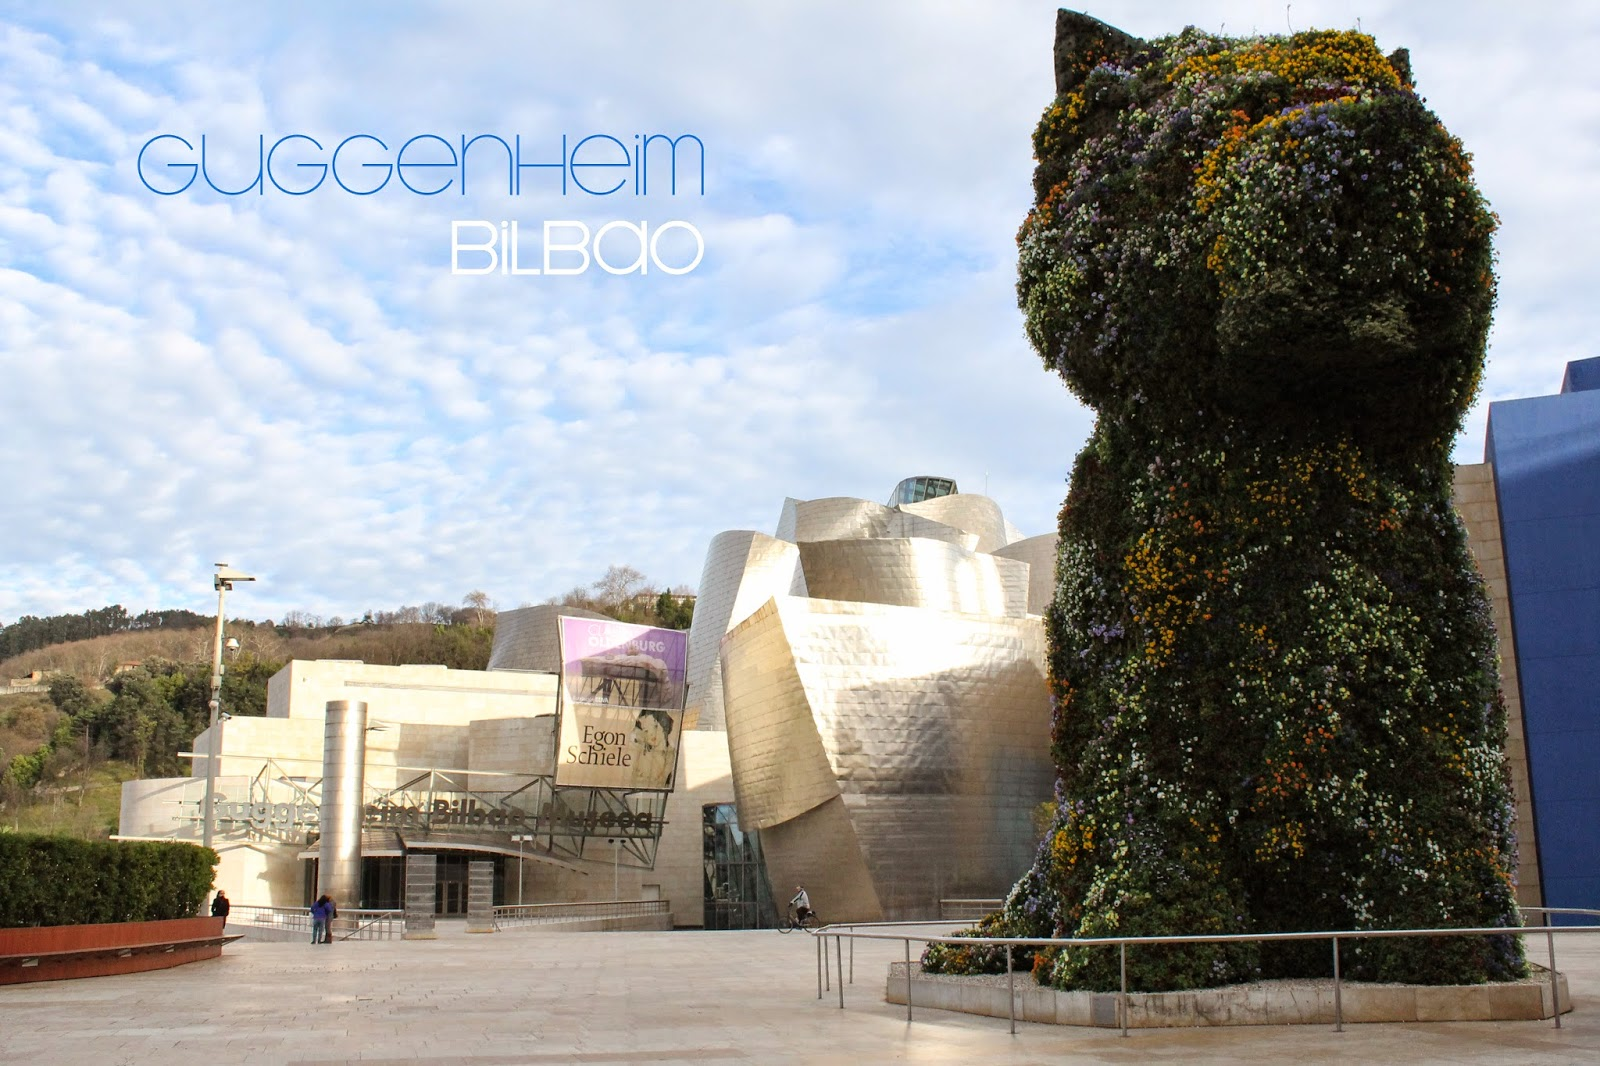 Titulo post Guggenheim Bilbao